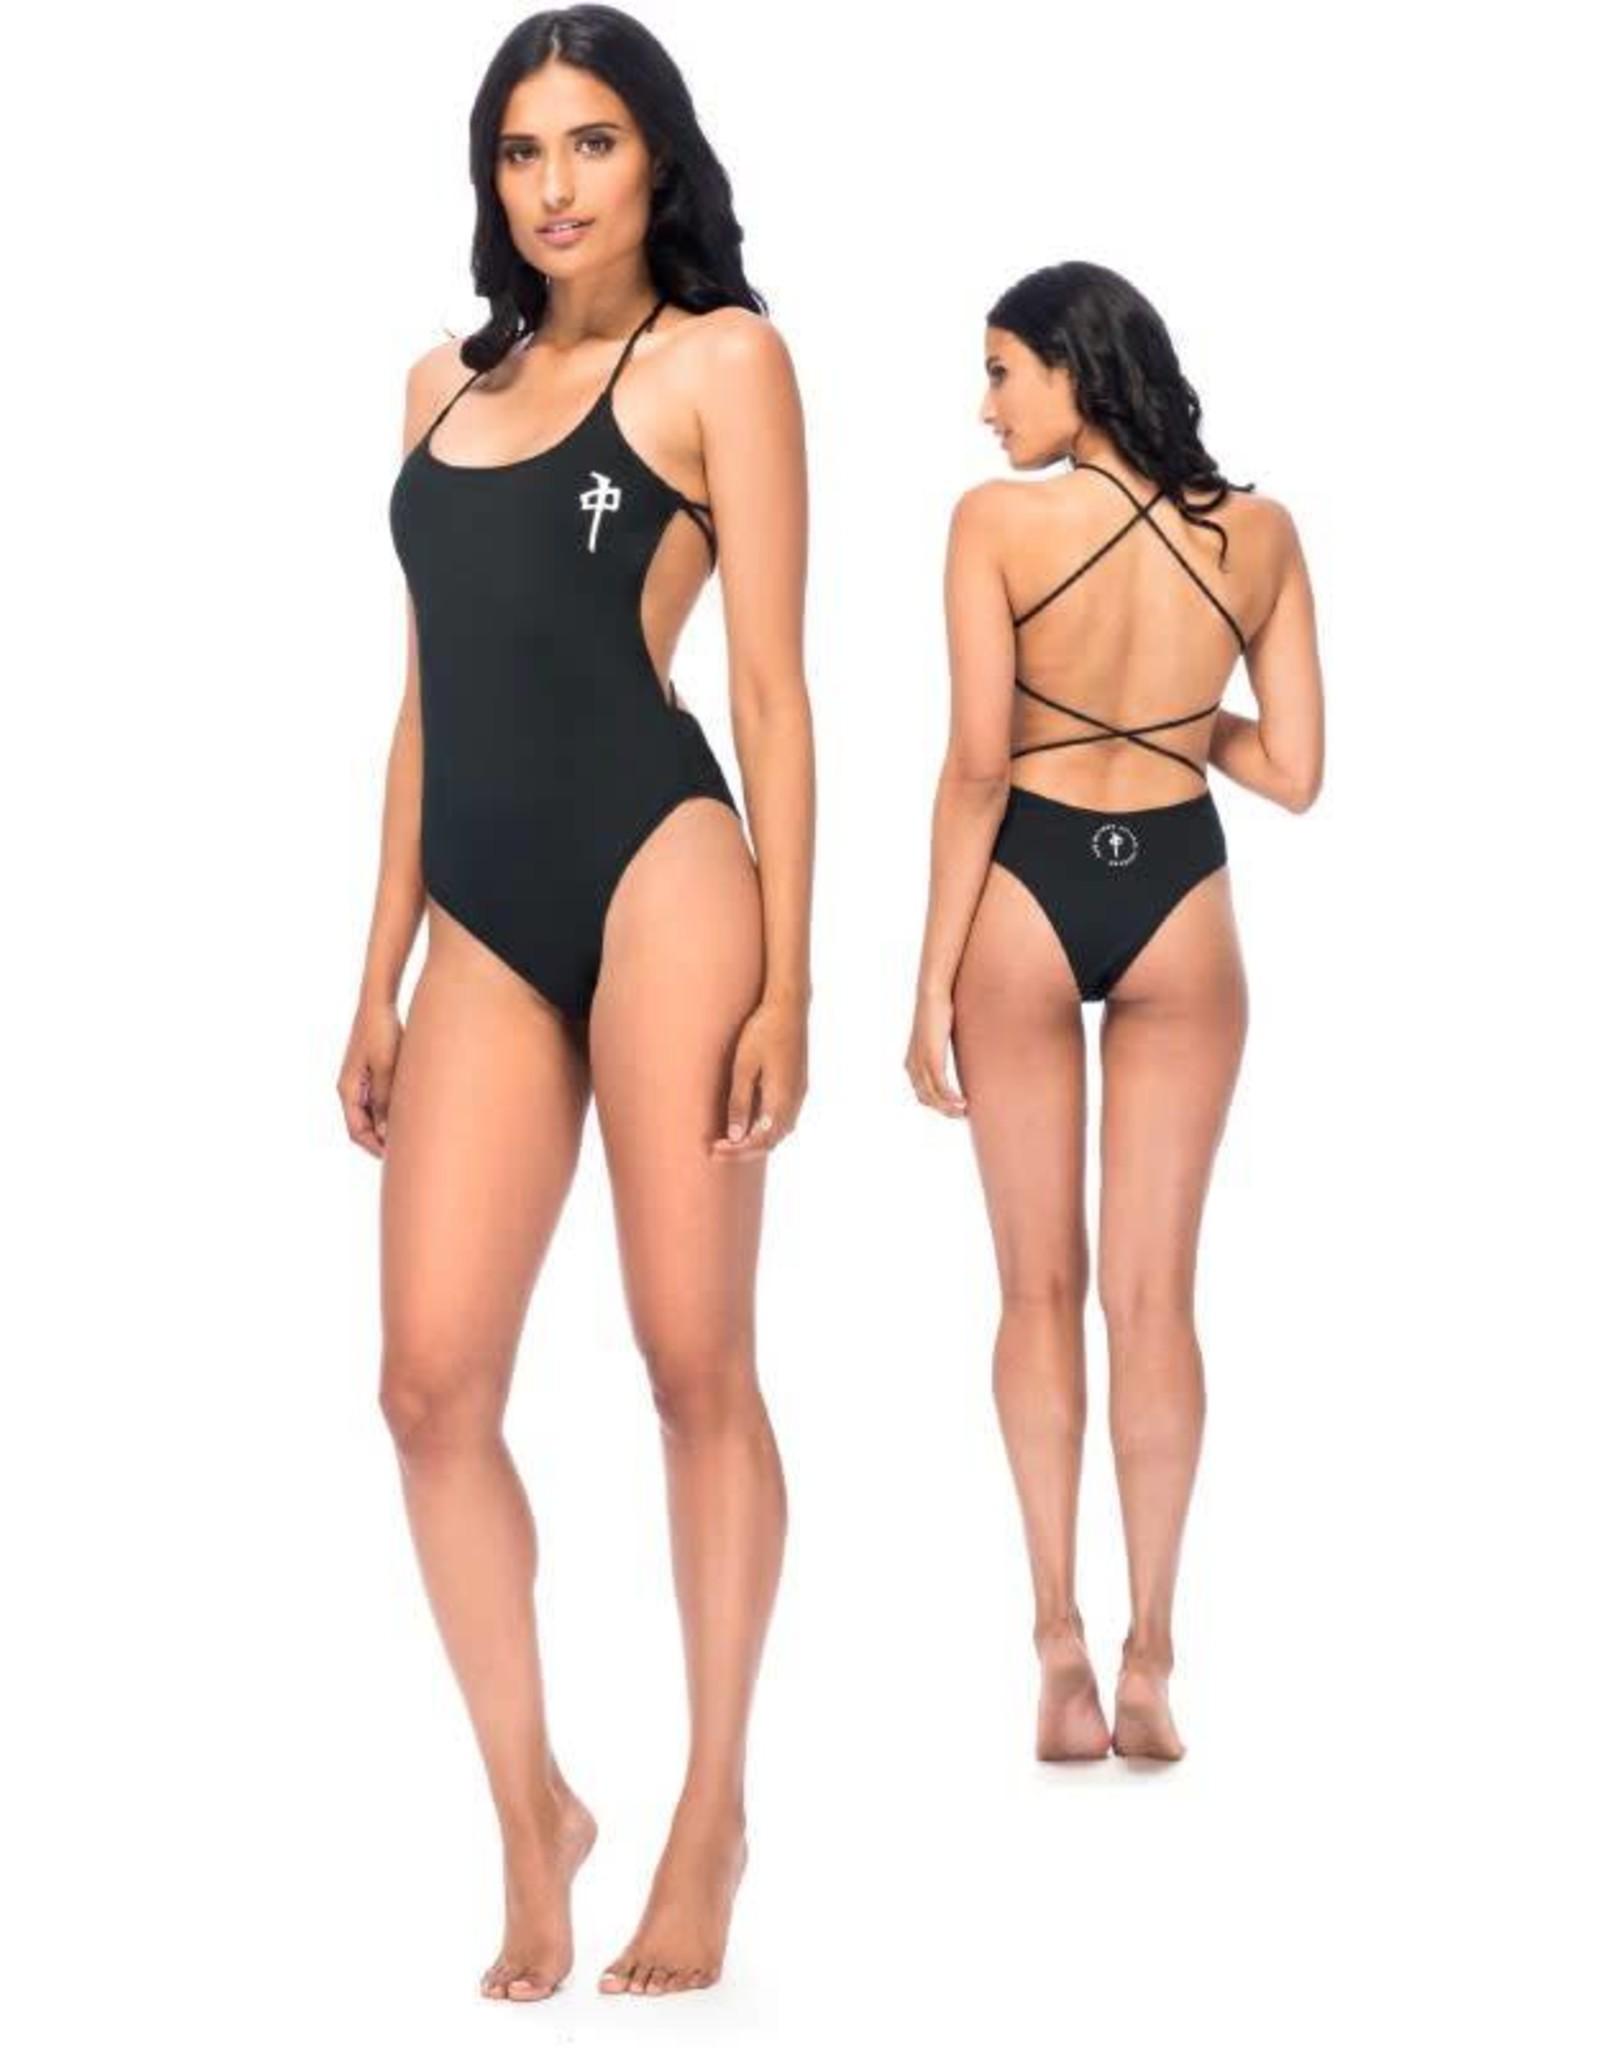 RDS RDS - LADYSMITH 1 Piece Bikini - Black -